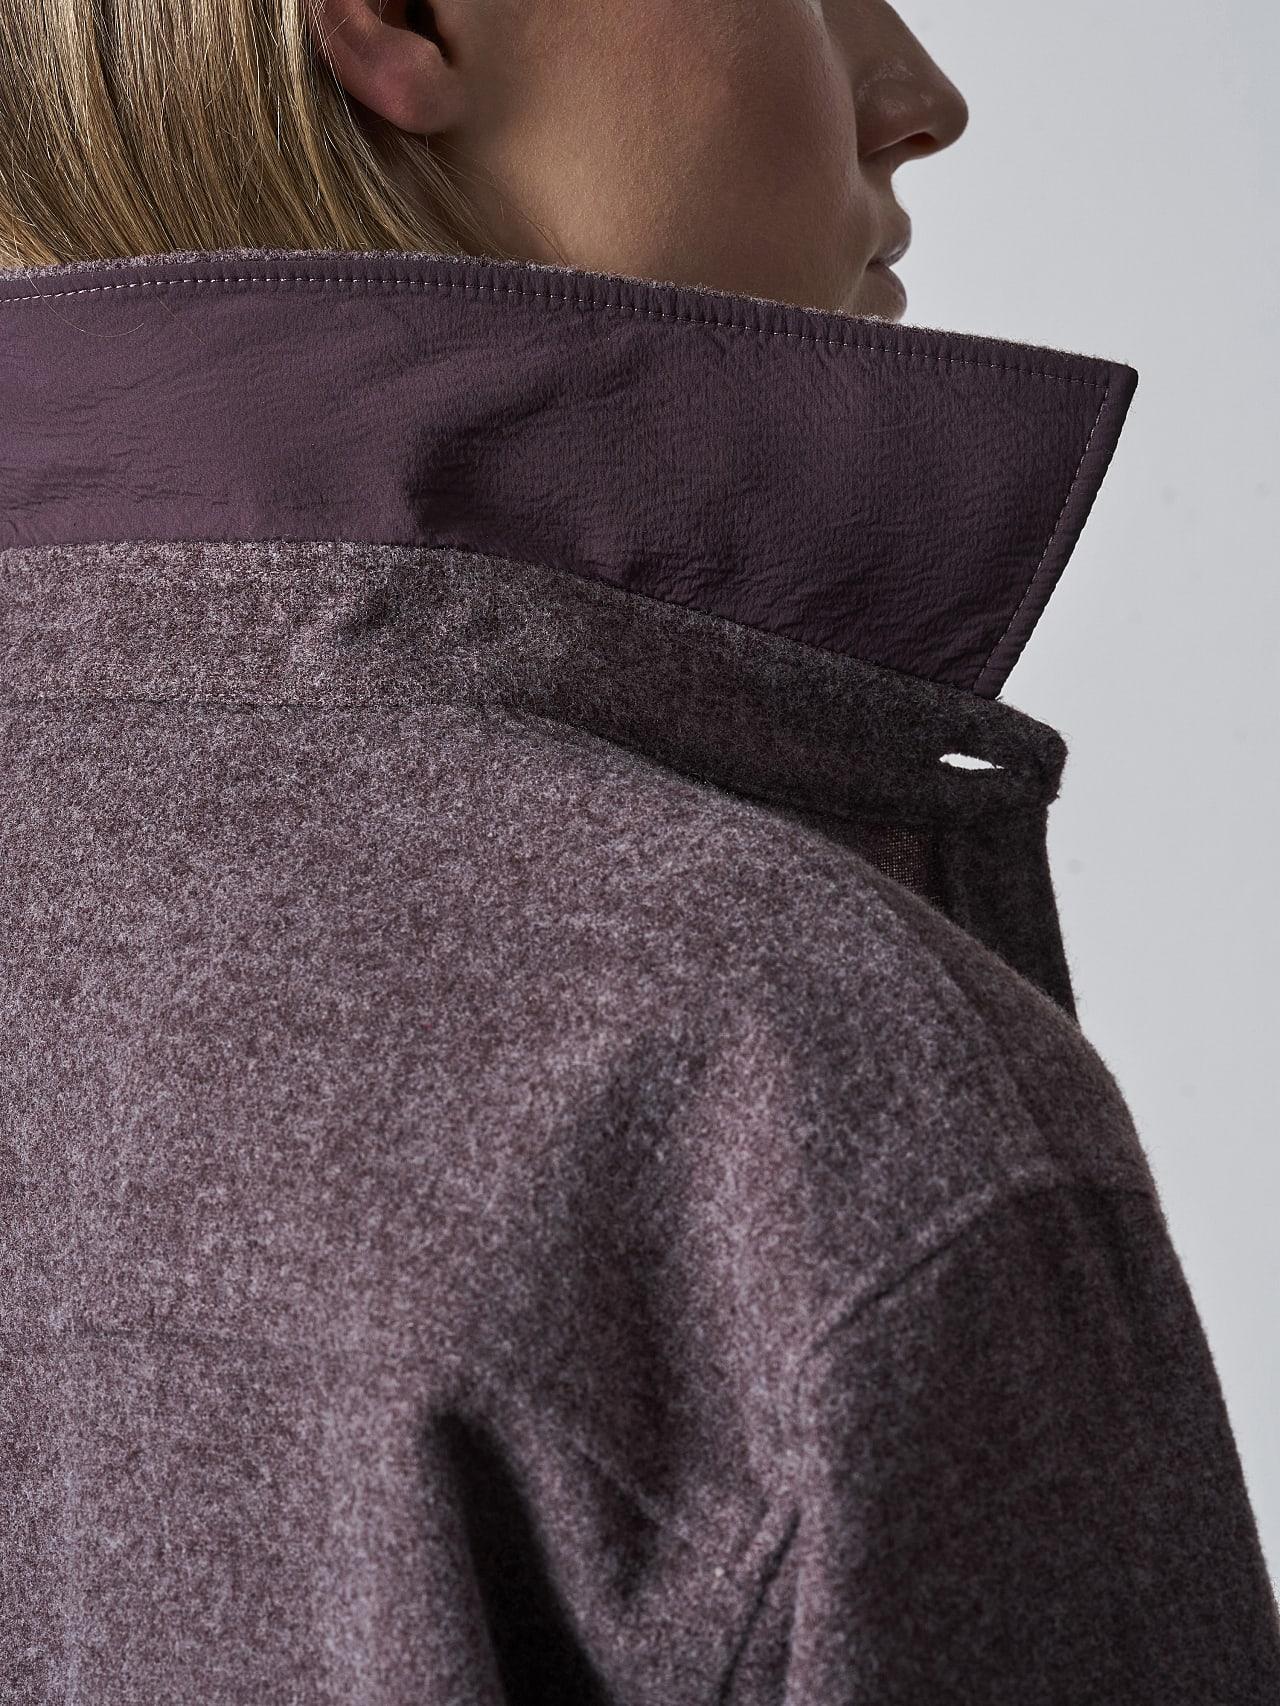 WOVIE V1.Y5.02 Wool Over-Shirt Burgundy scene7.view.8.name Alpha Tauri